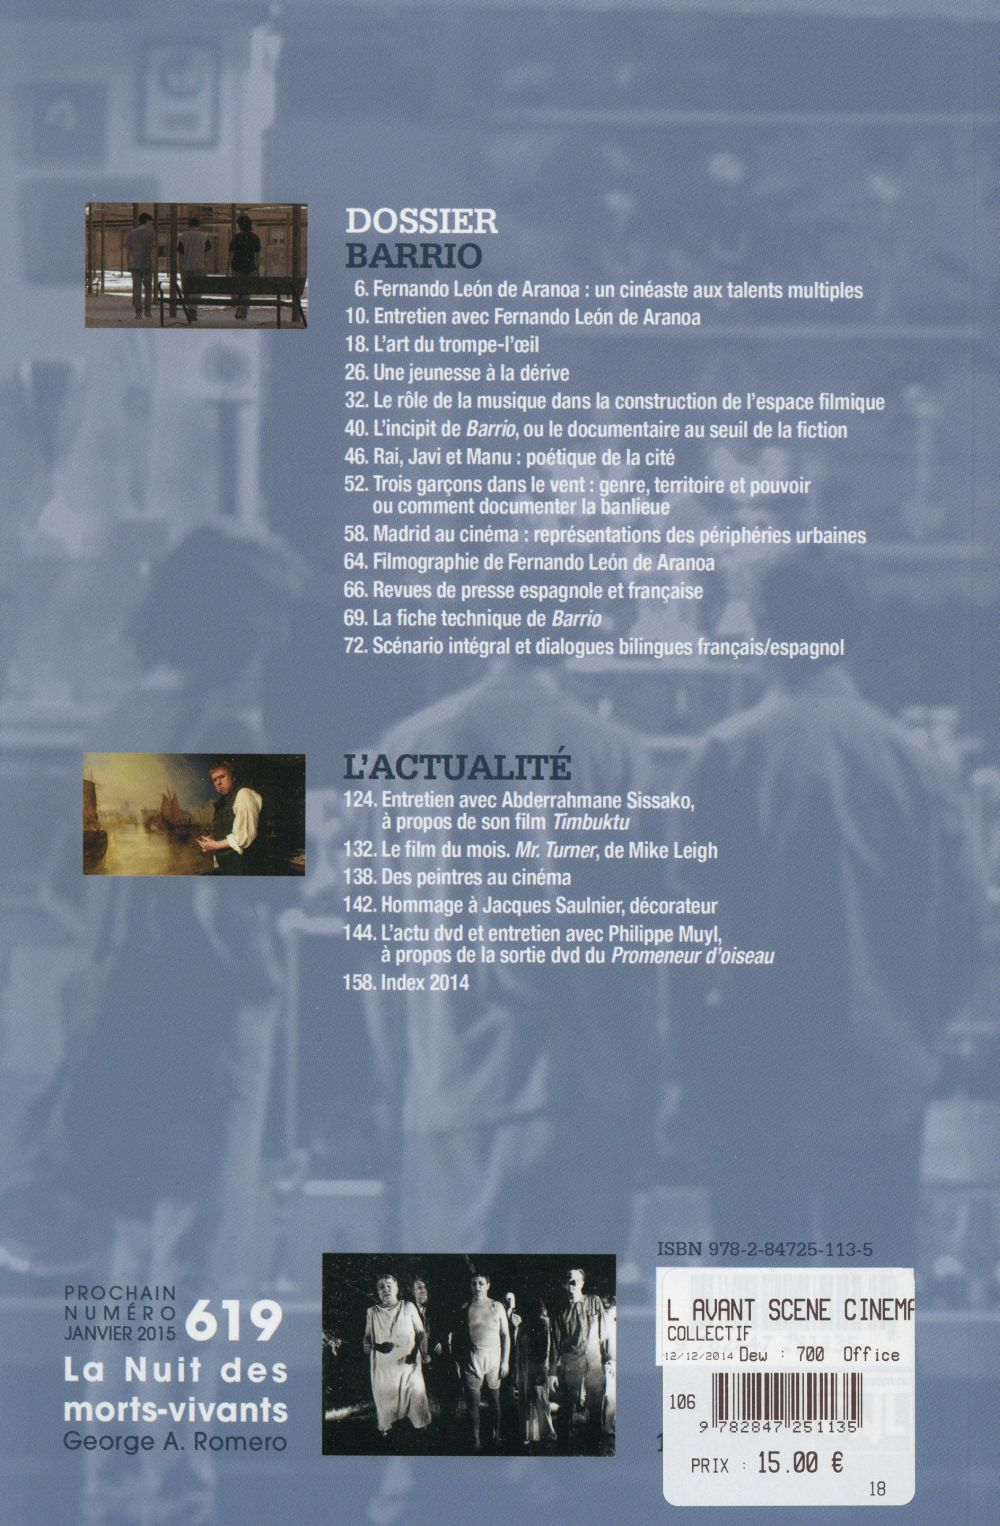 L'avant-scene cinema t.618; barrio